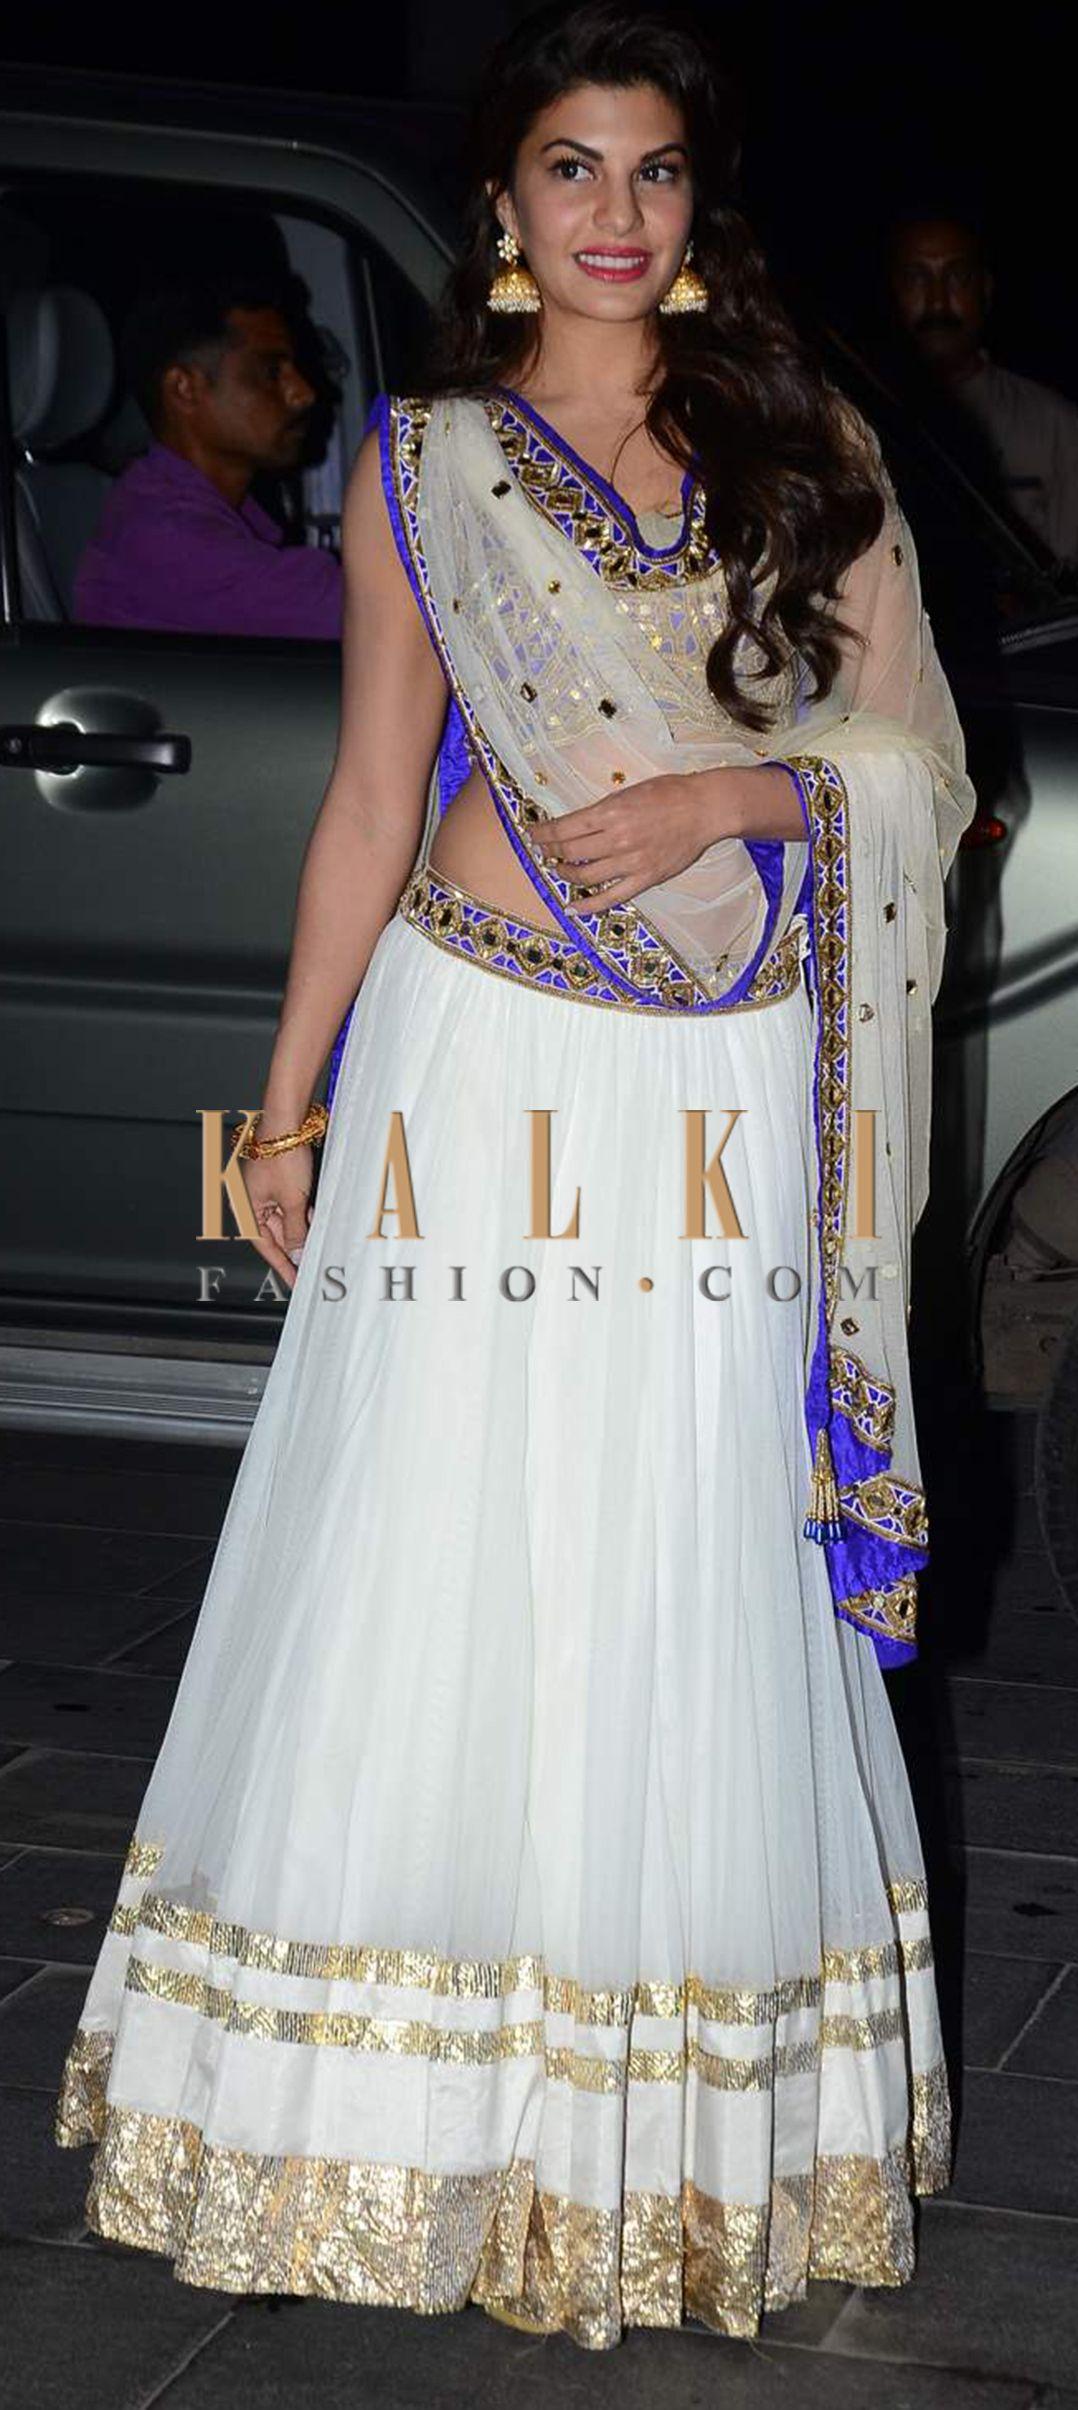 Pin by Hiren Panchal on 1 - Indian Fashion Modern | Indian ...